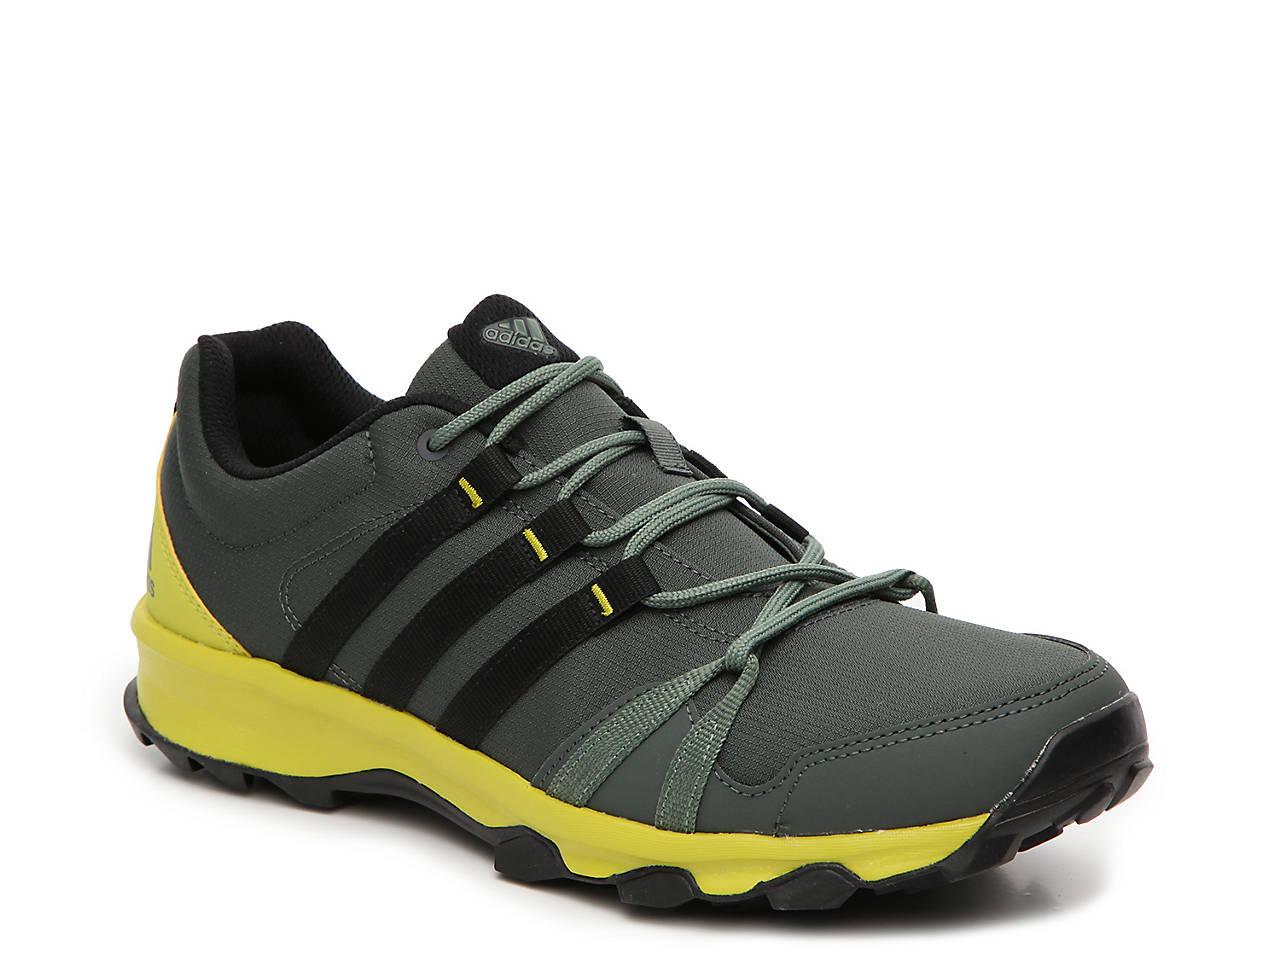 843ee6279d2 adidas Terrex Tracerocker Trail Shoe Men s Shoes